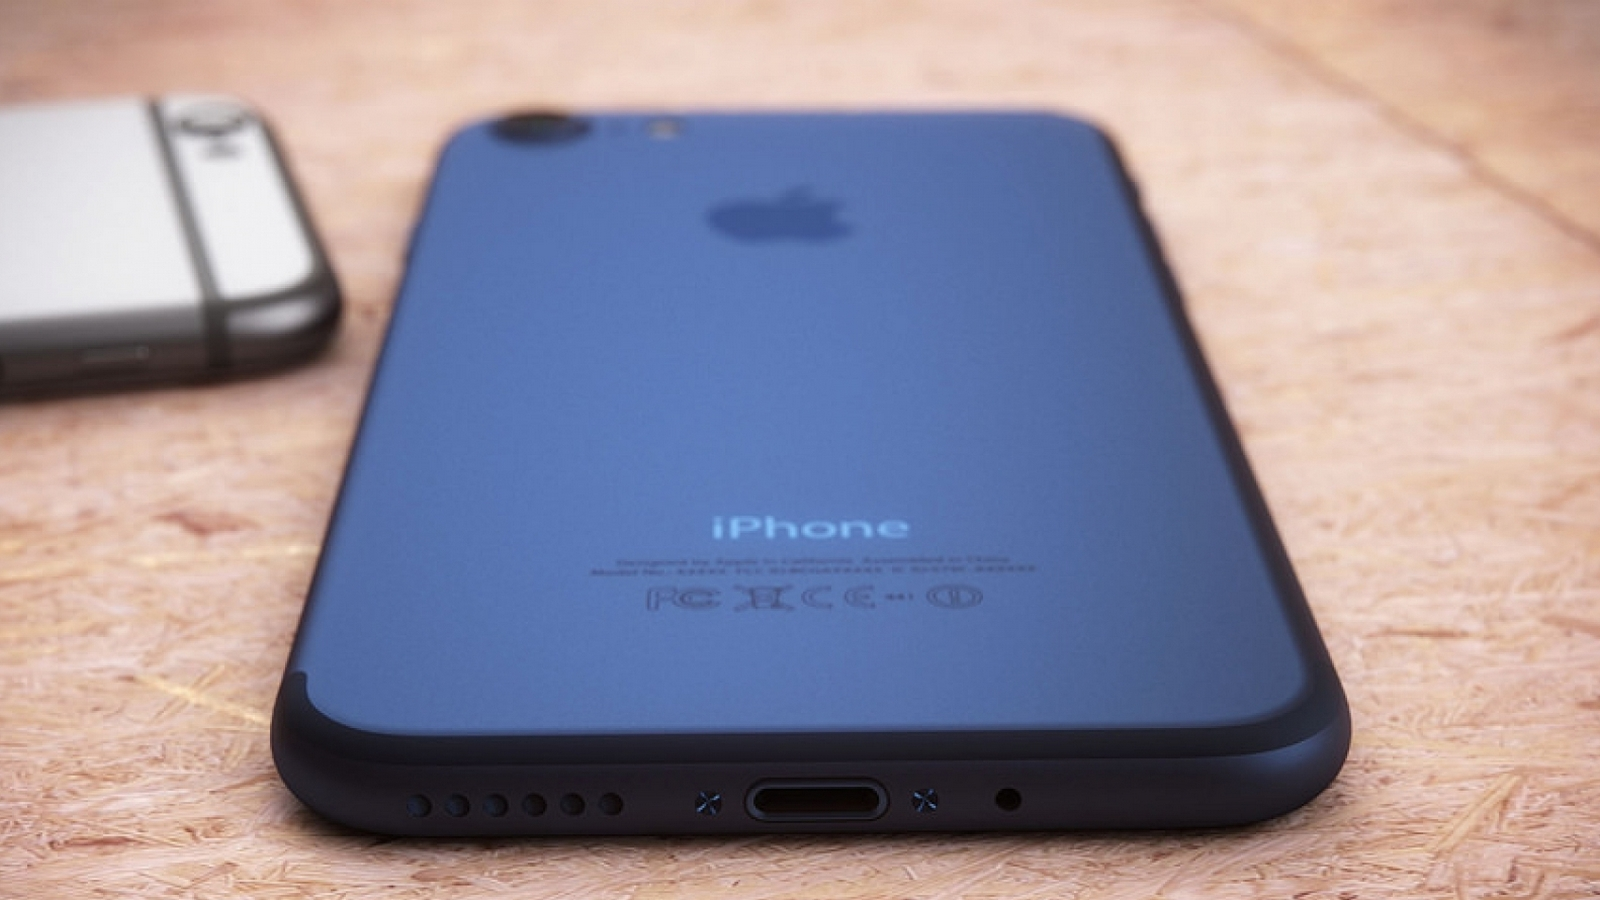 Блогер снял видео теста IPhone 7 на прочность